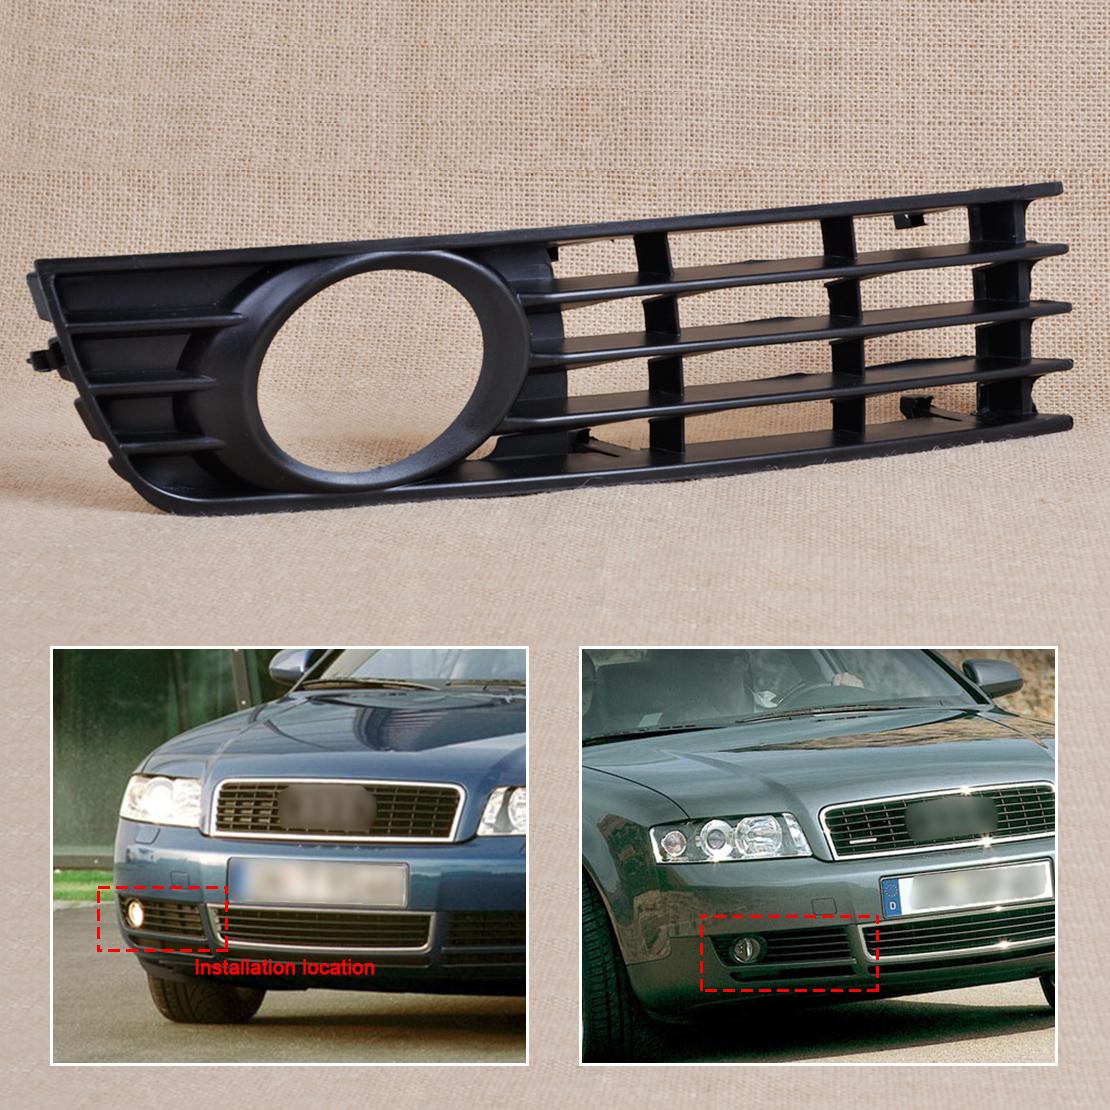 8e0807682 front right bumper fog light lower grille for 2002 2005 rh ebay com 2002 Audi A6 Service Manual 2002 Audi A6 Quattro Manual